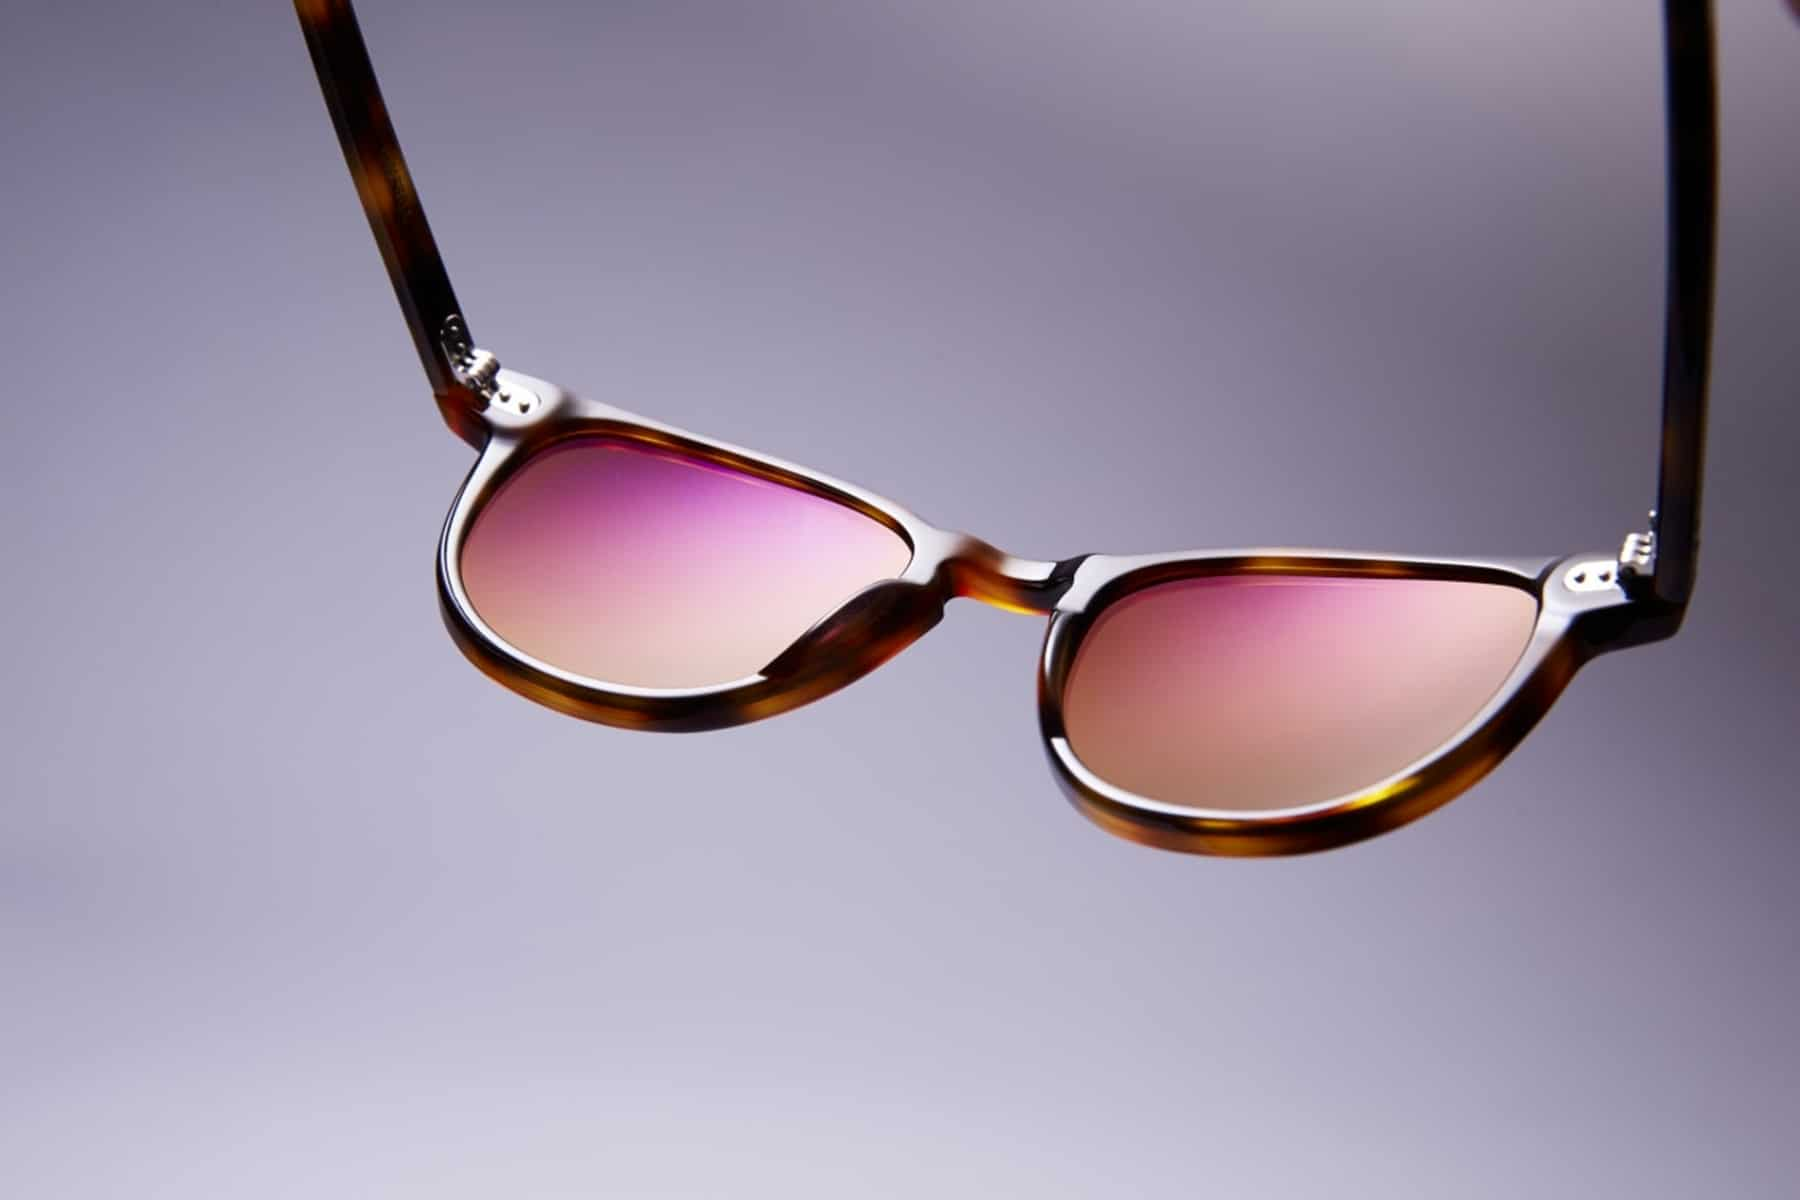 23 Stylish Men's Sunglasses Under $200: Around the World in 23 Shades